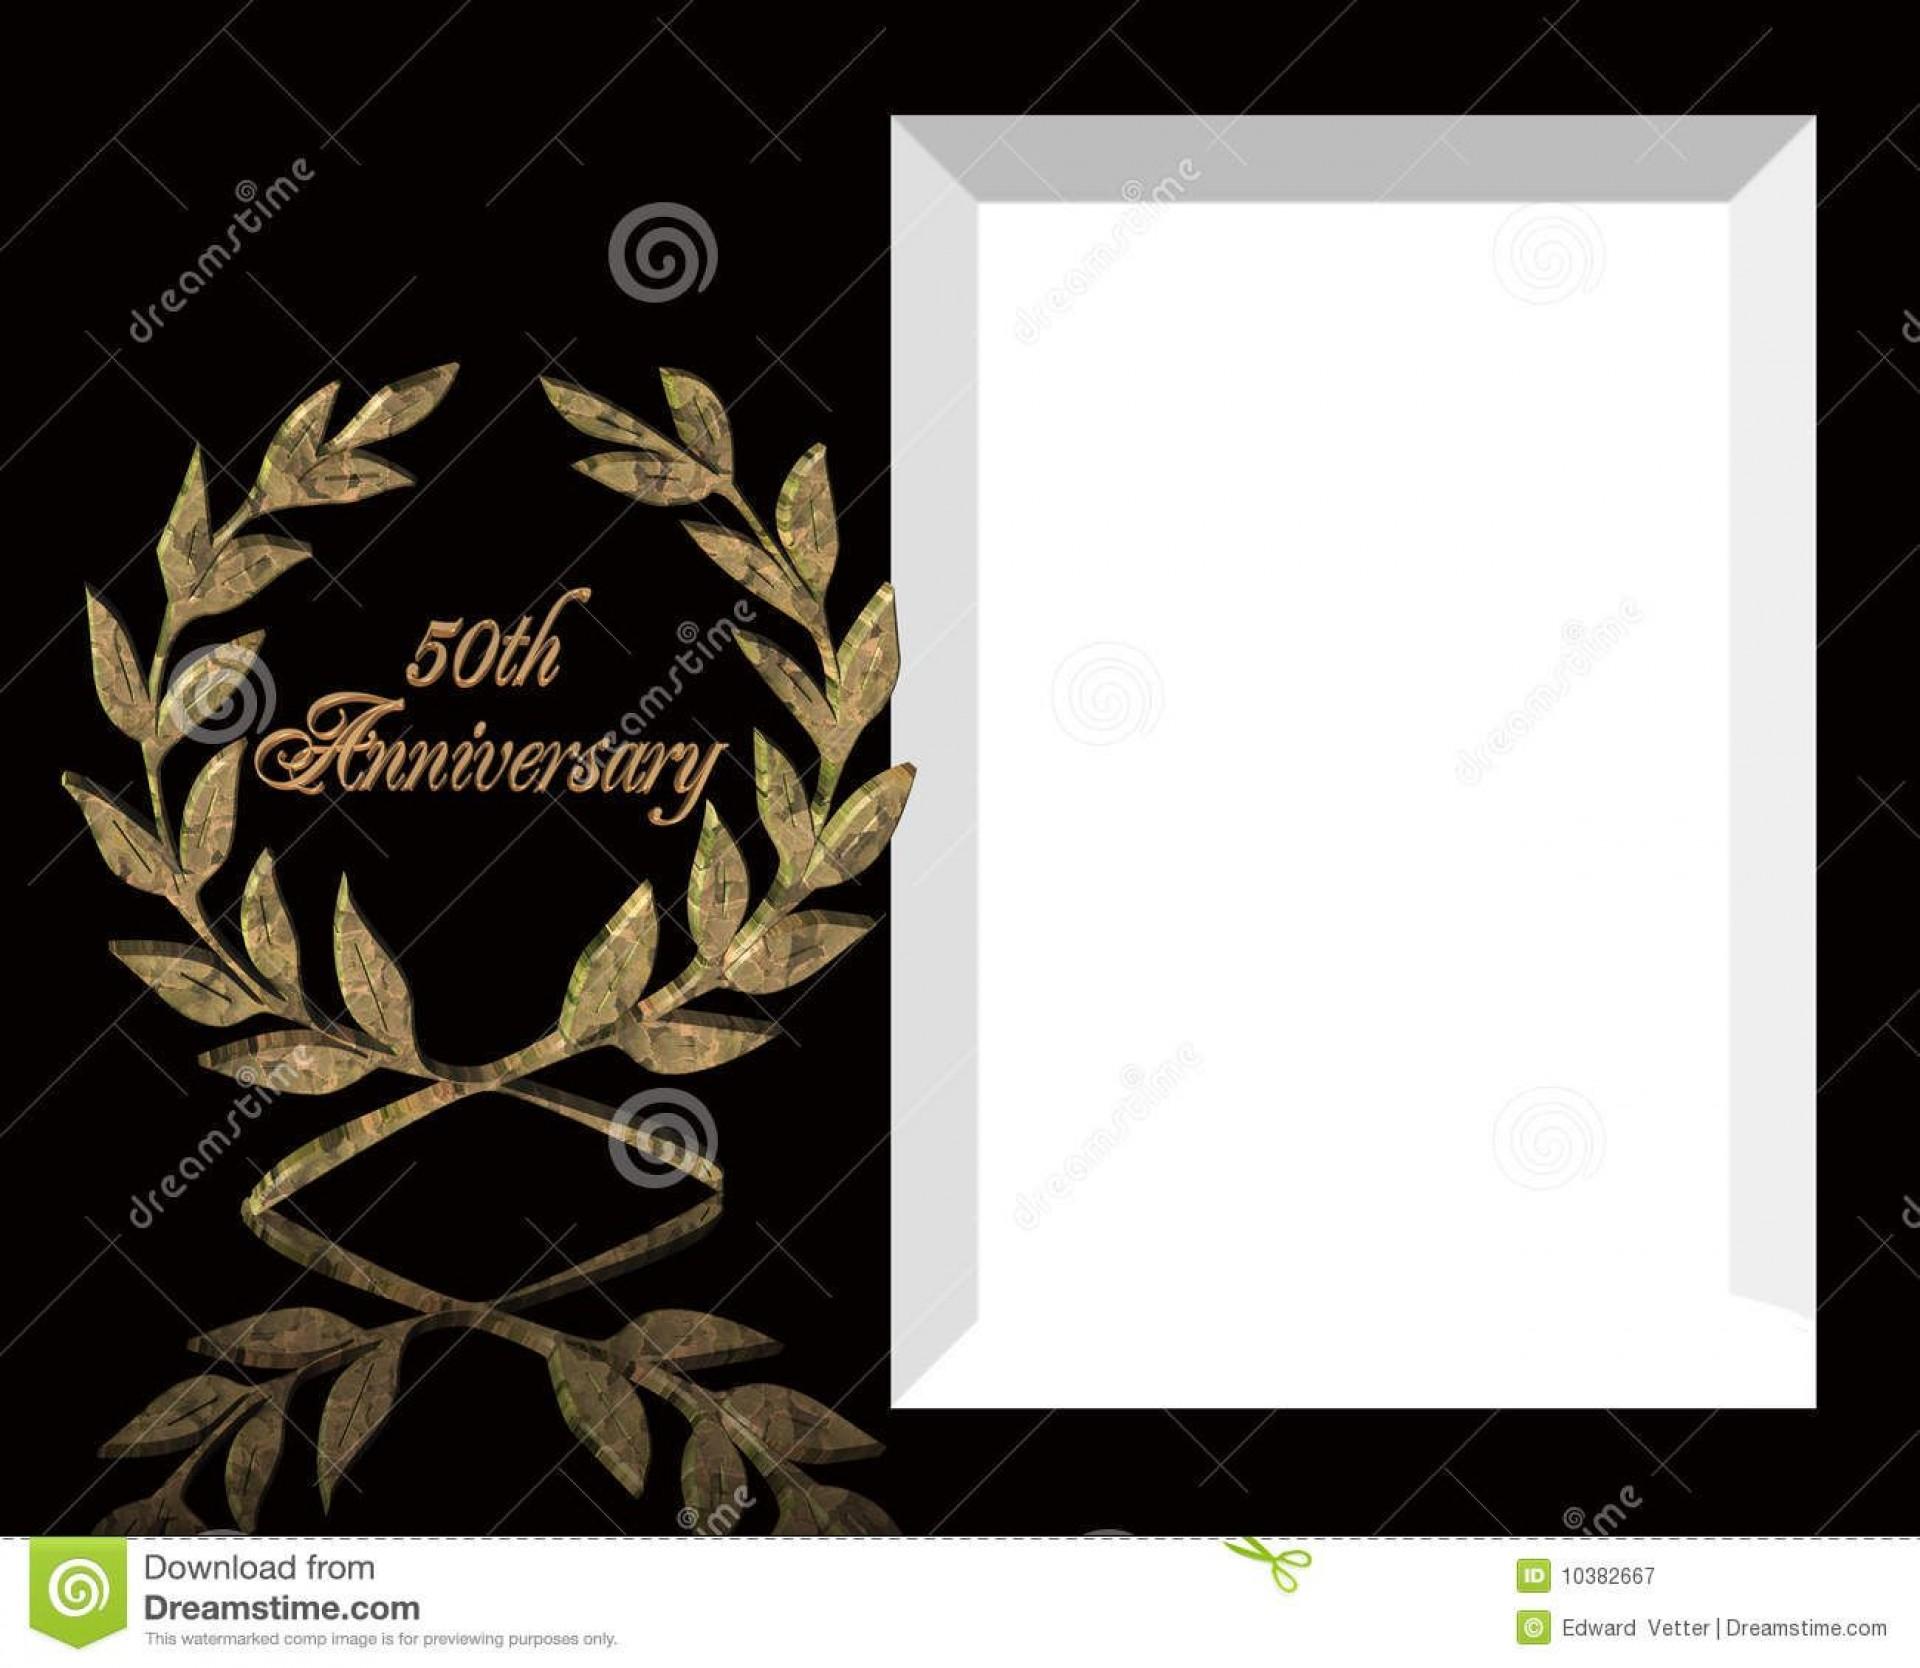 002 Rare 50th Wedding Anniversary Invitation Card Sample Design  Wording1920